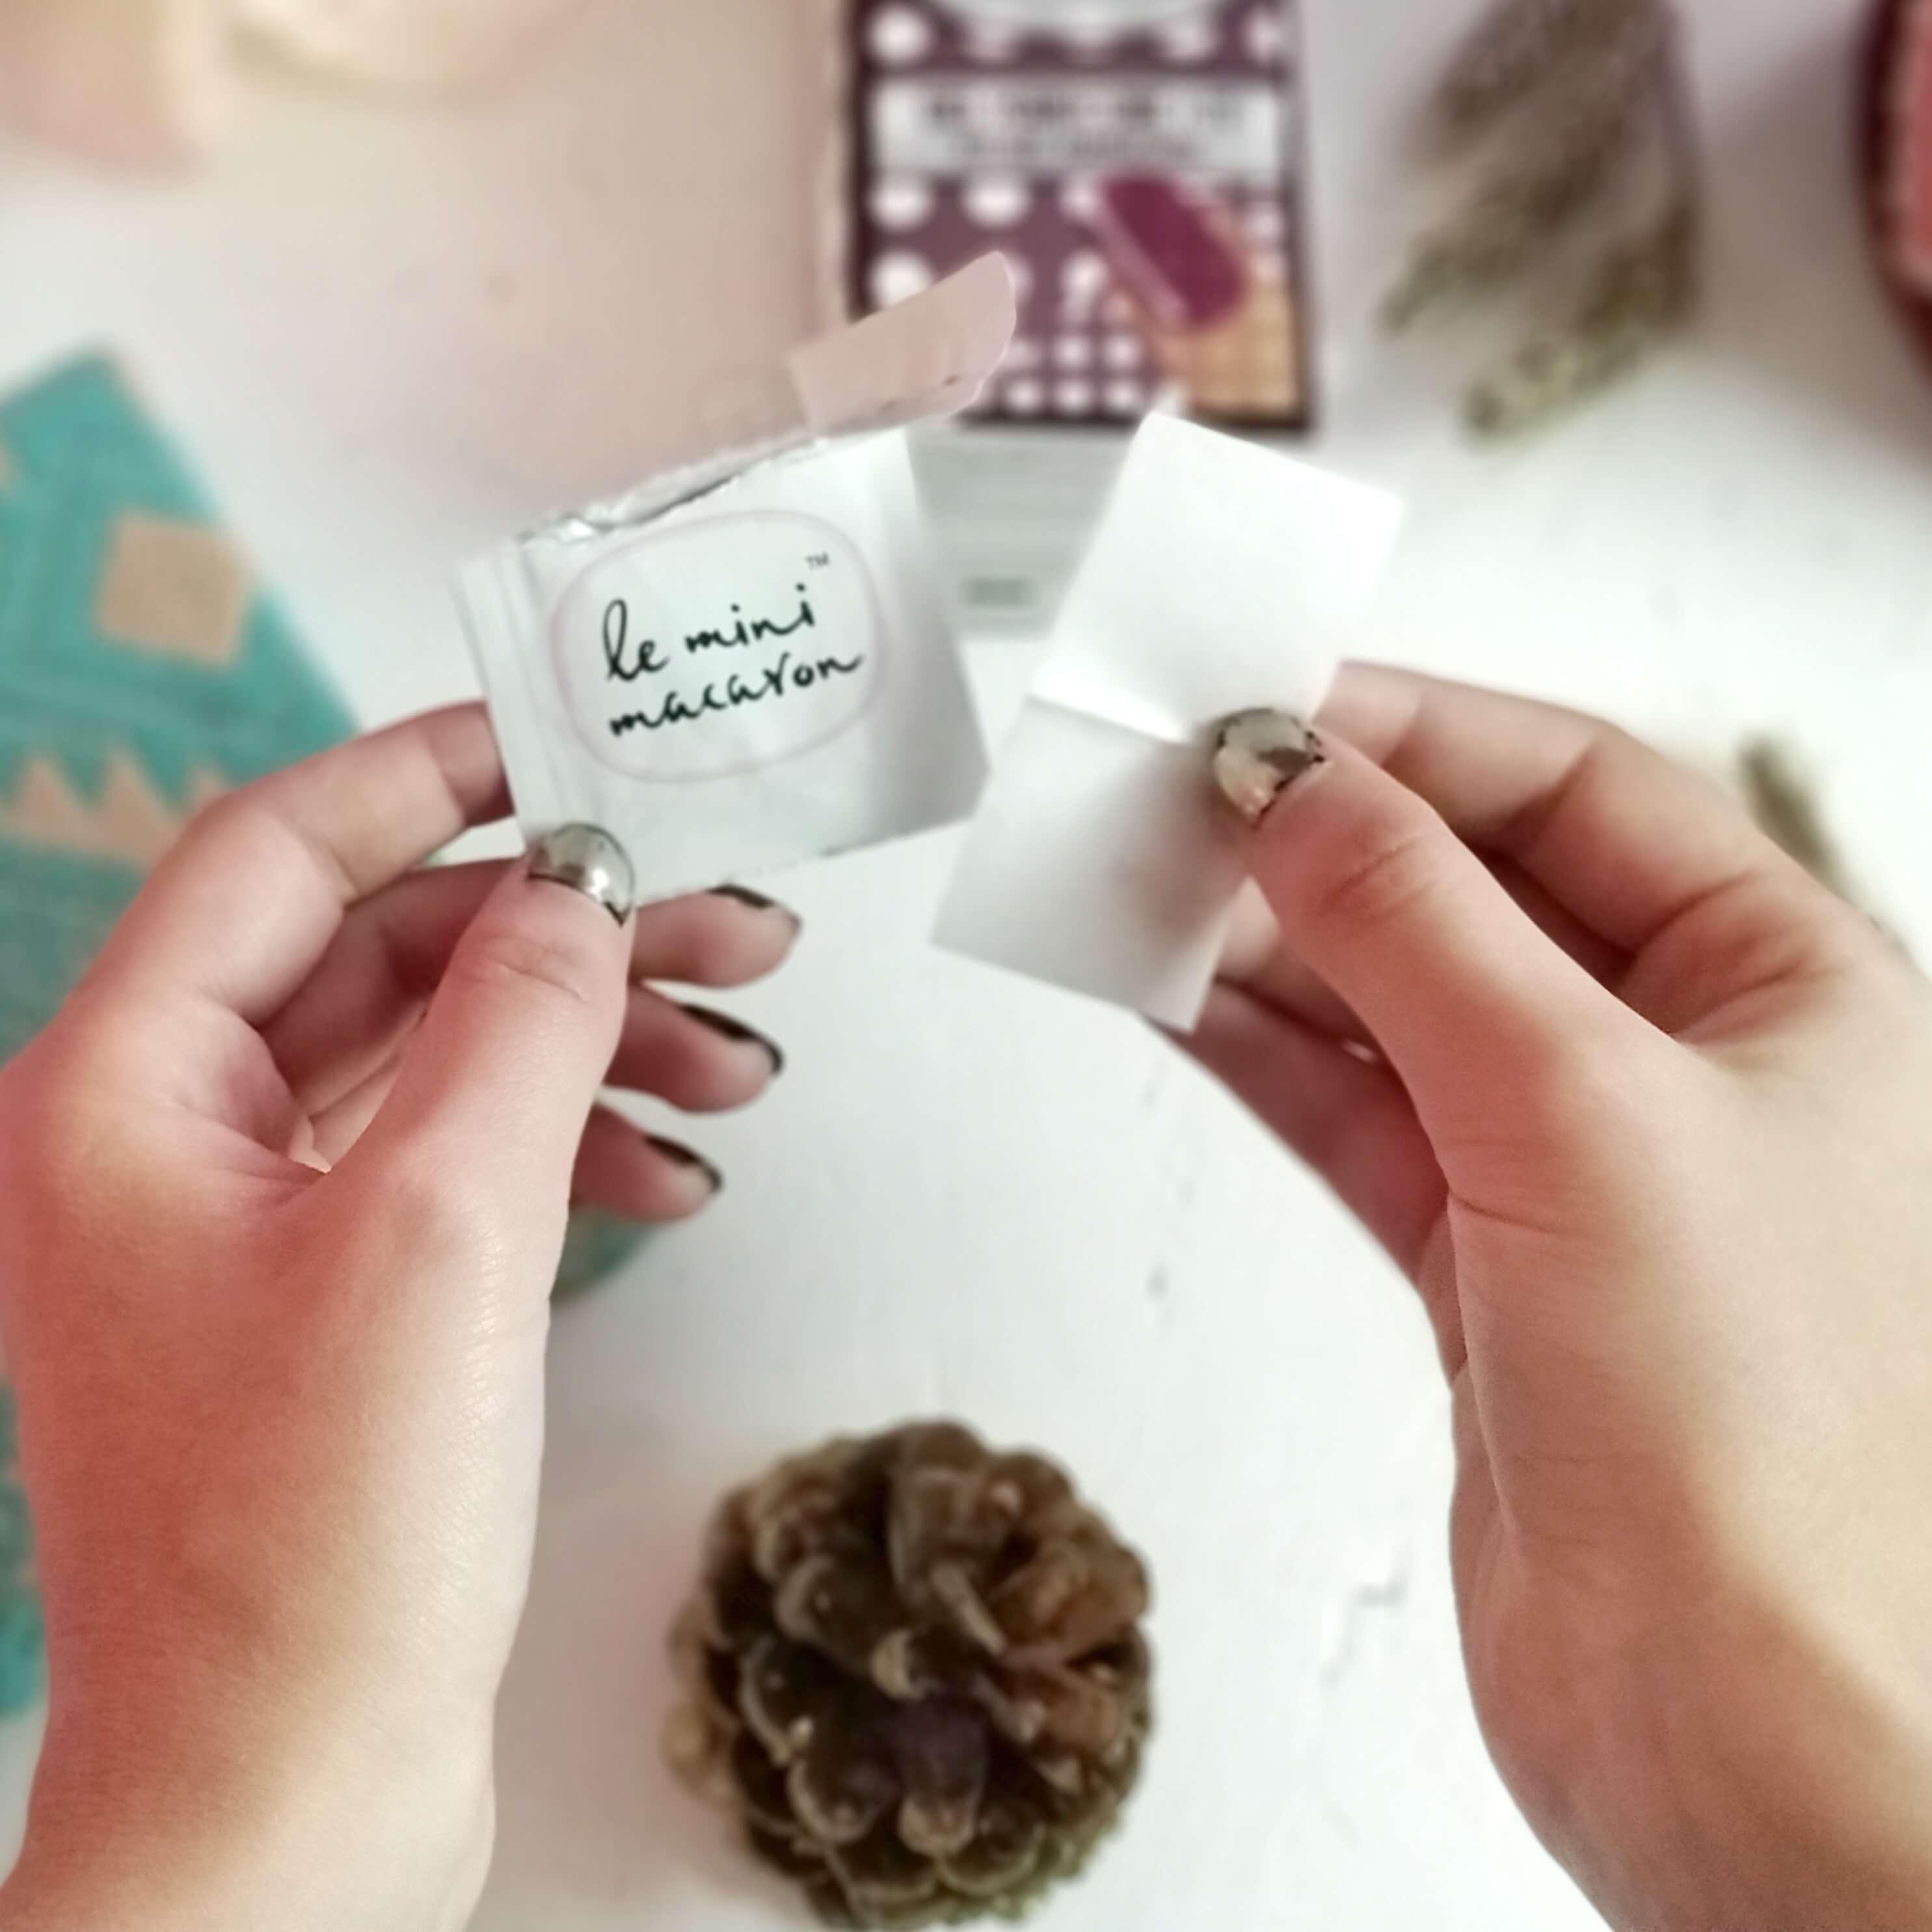 enlever vernis semi permanent mini macaron - Une manucure semi-permanente à faire...chez soi